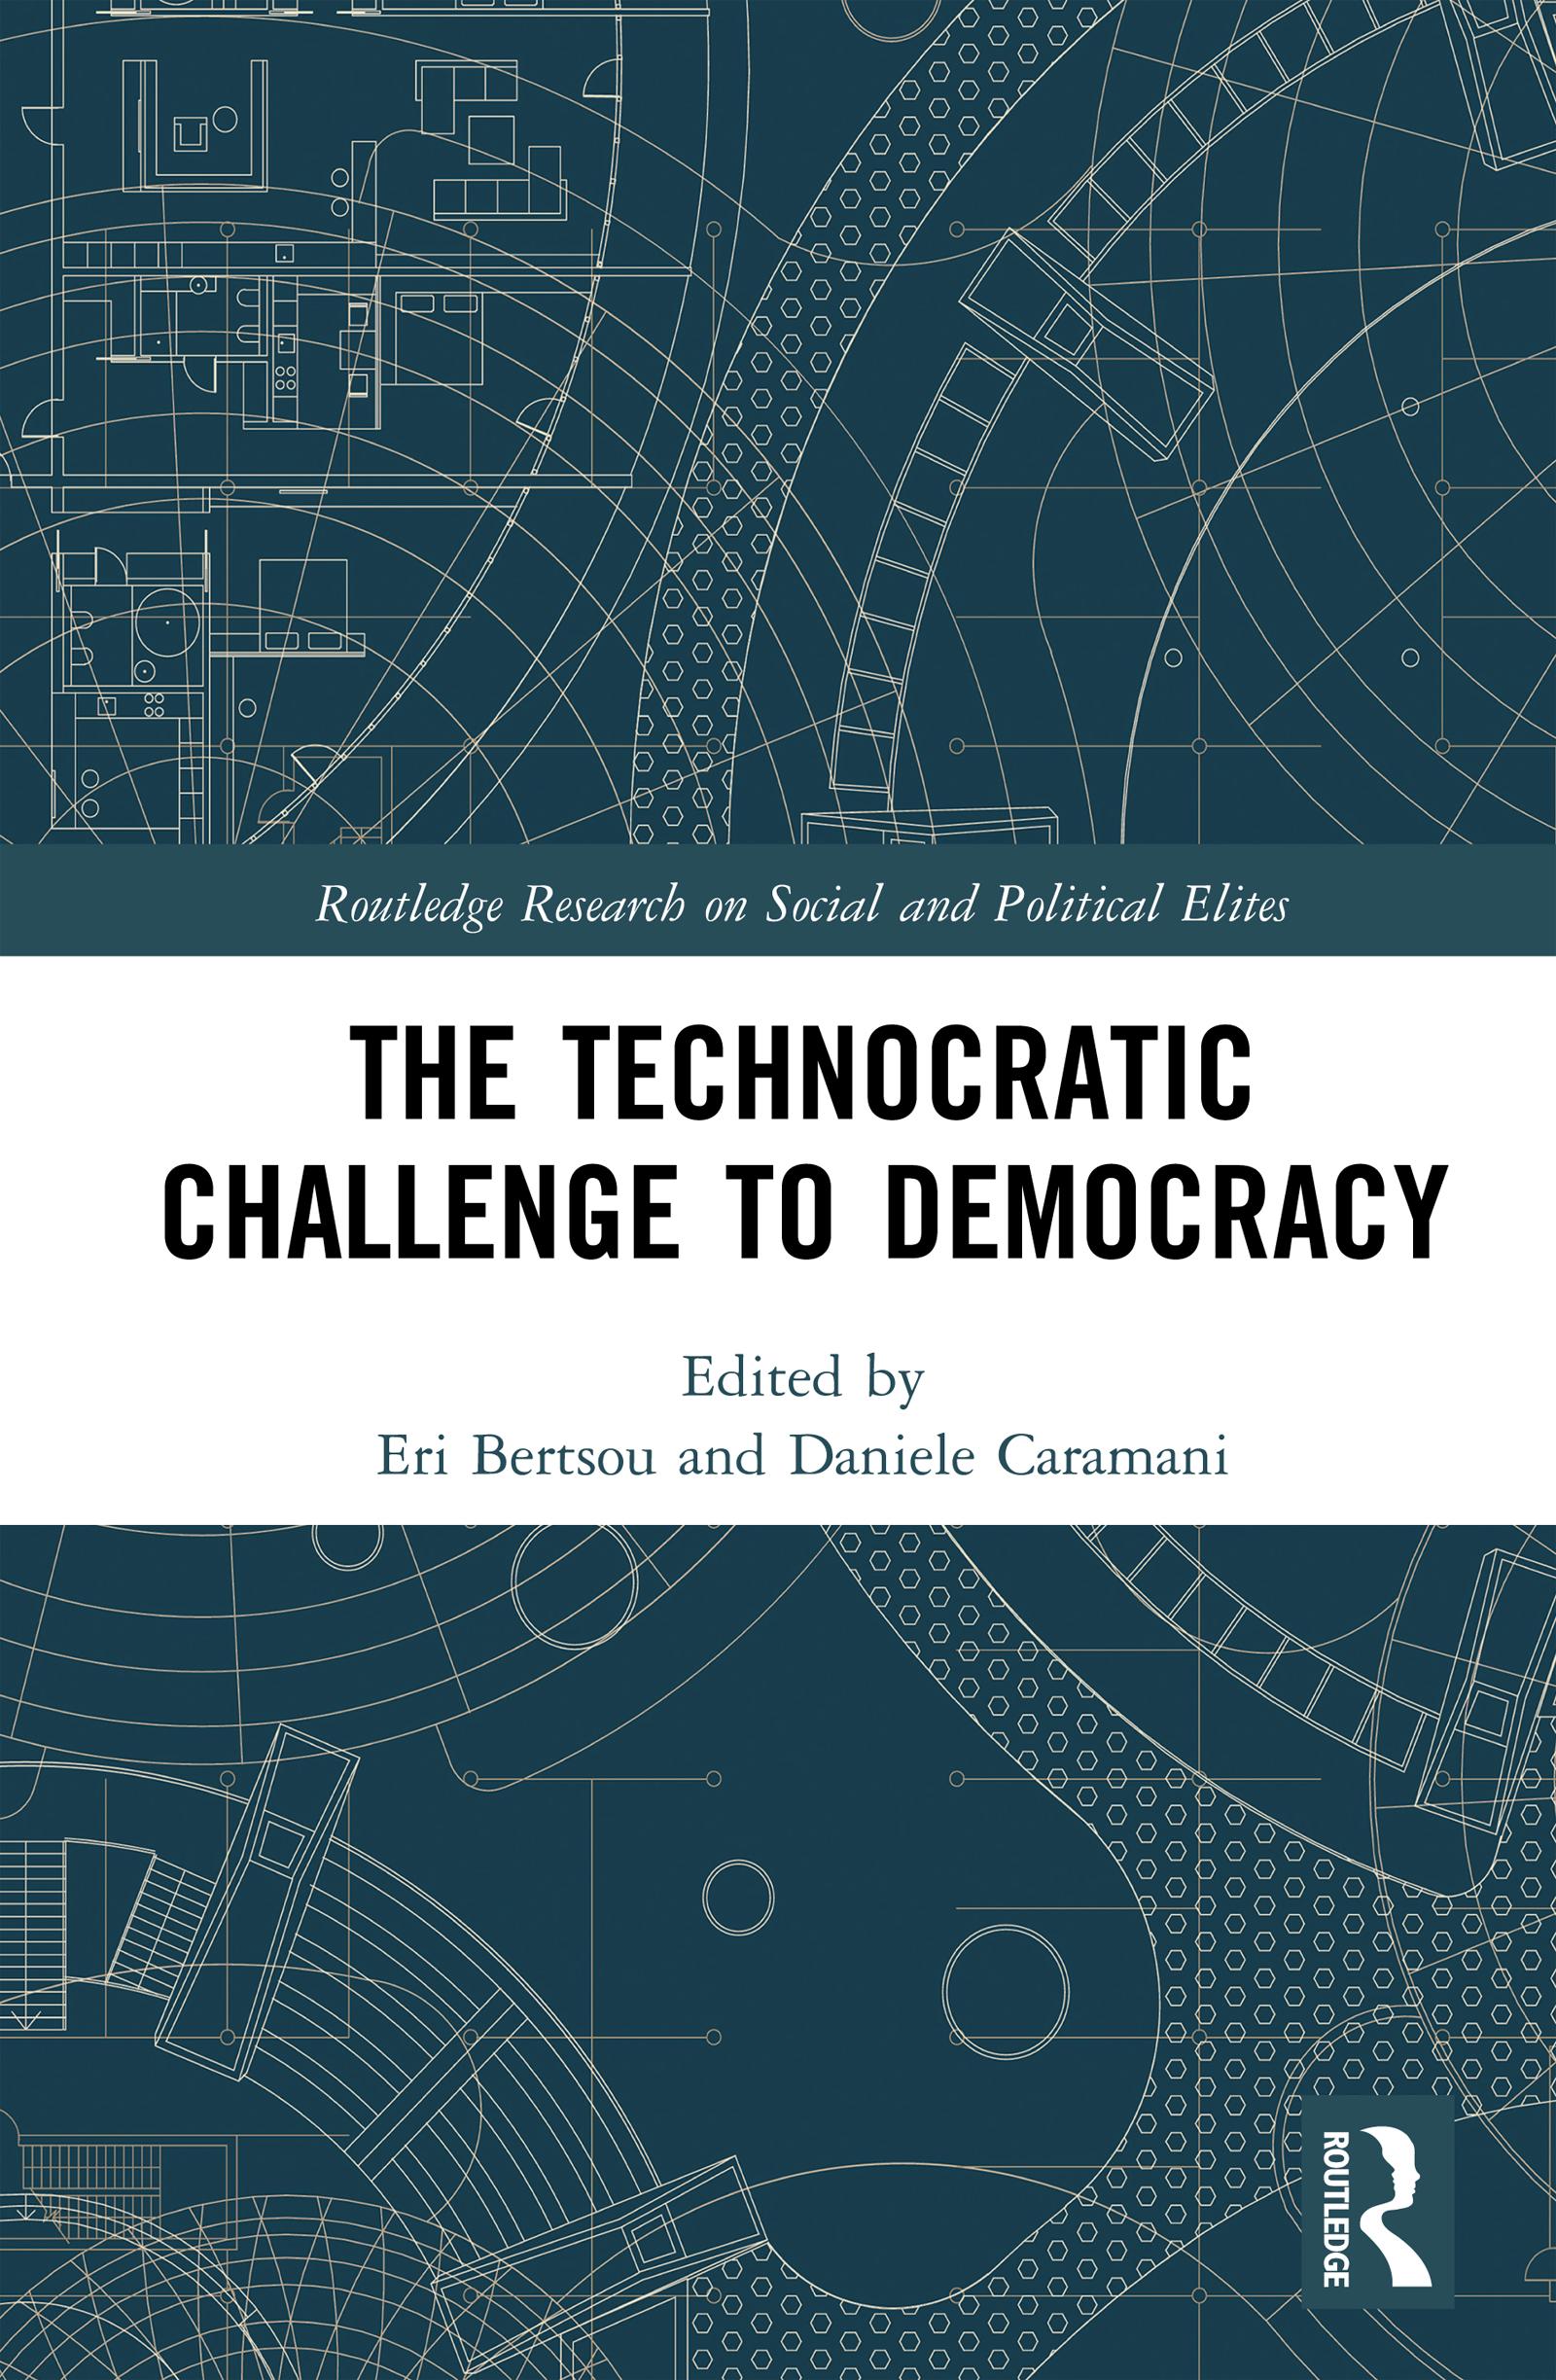 The Technocratic Challenge to Democracy